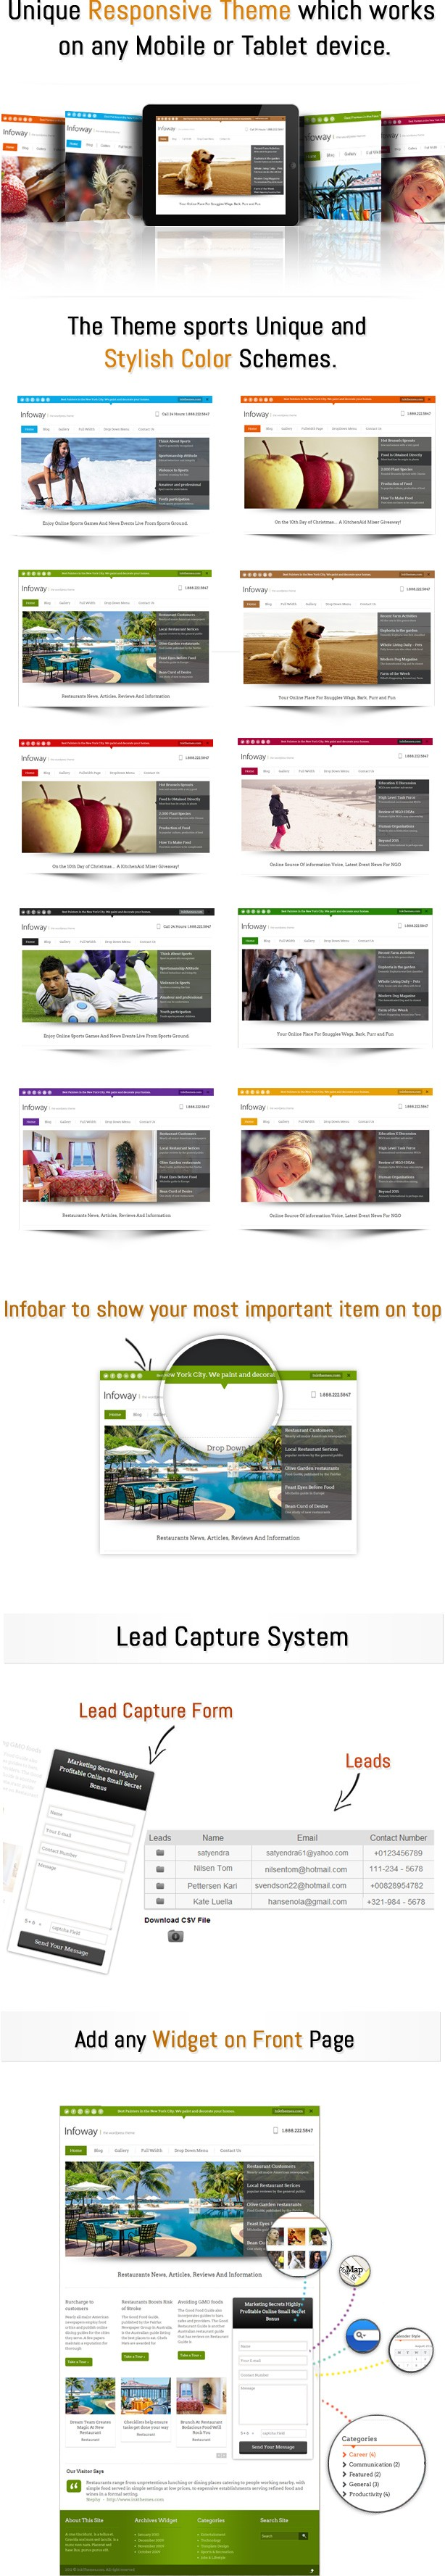 InfoWay features